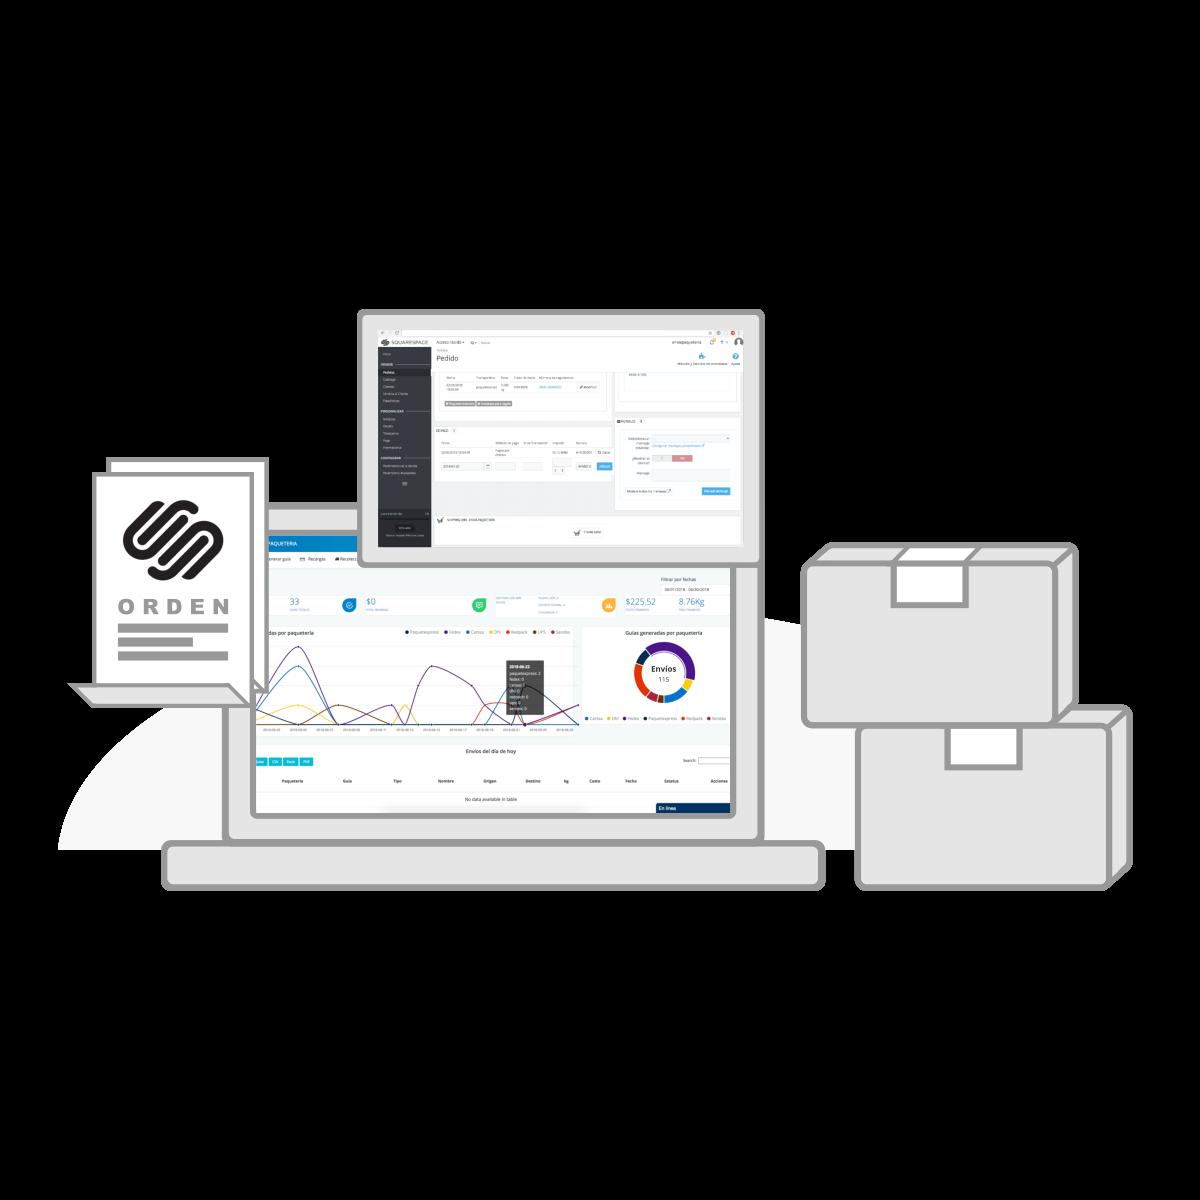 Envía - Integracion con Squarespace, realiza tus envios de paquetería.